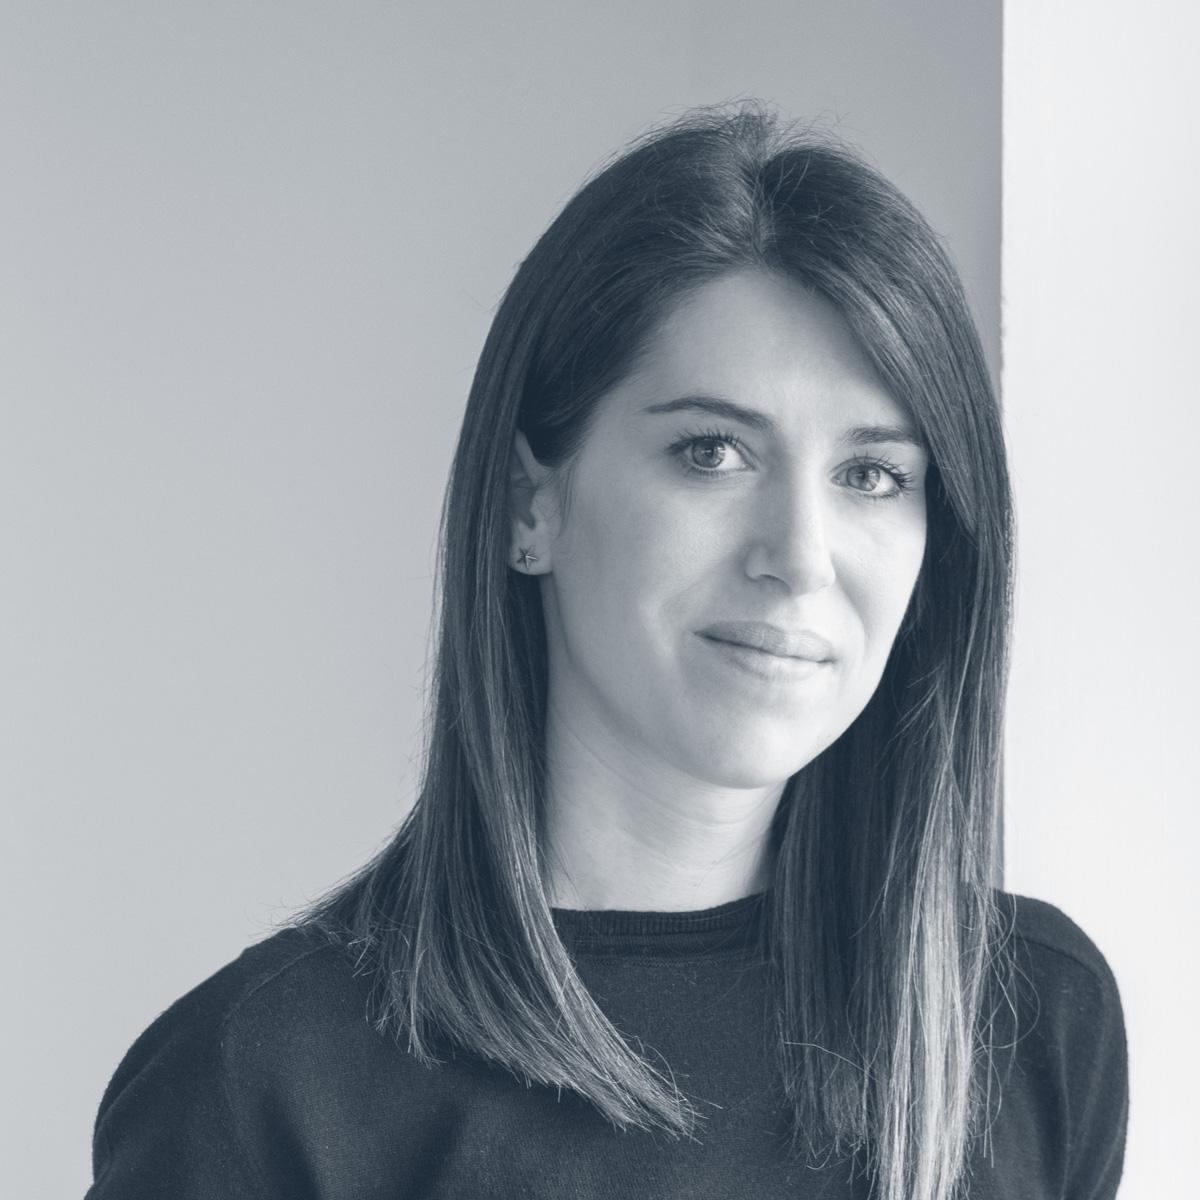 Carla Serena Sanchez